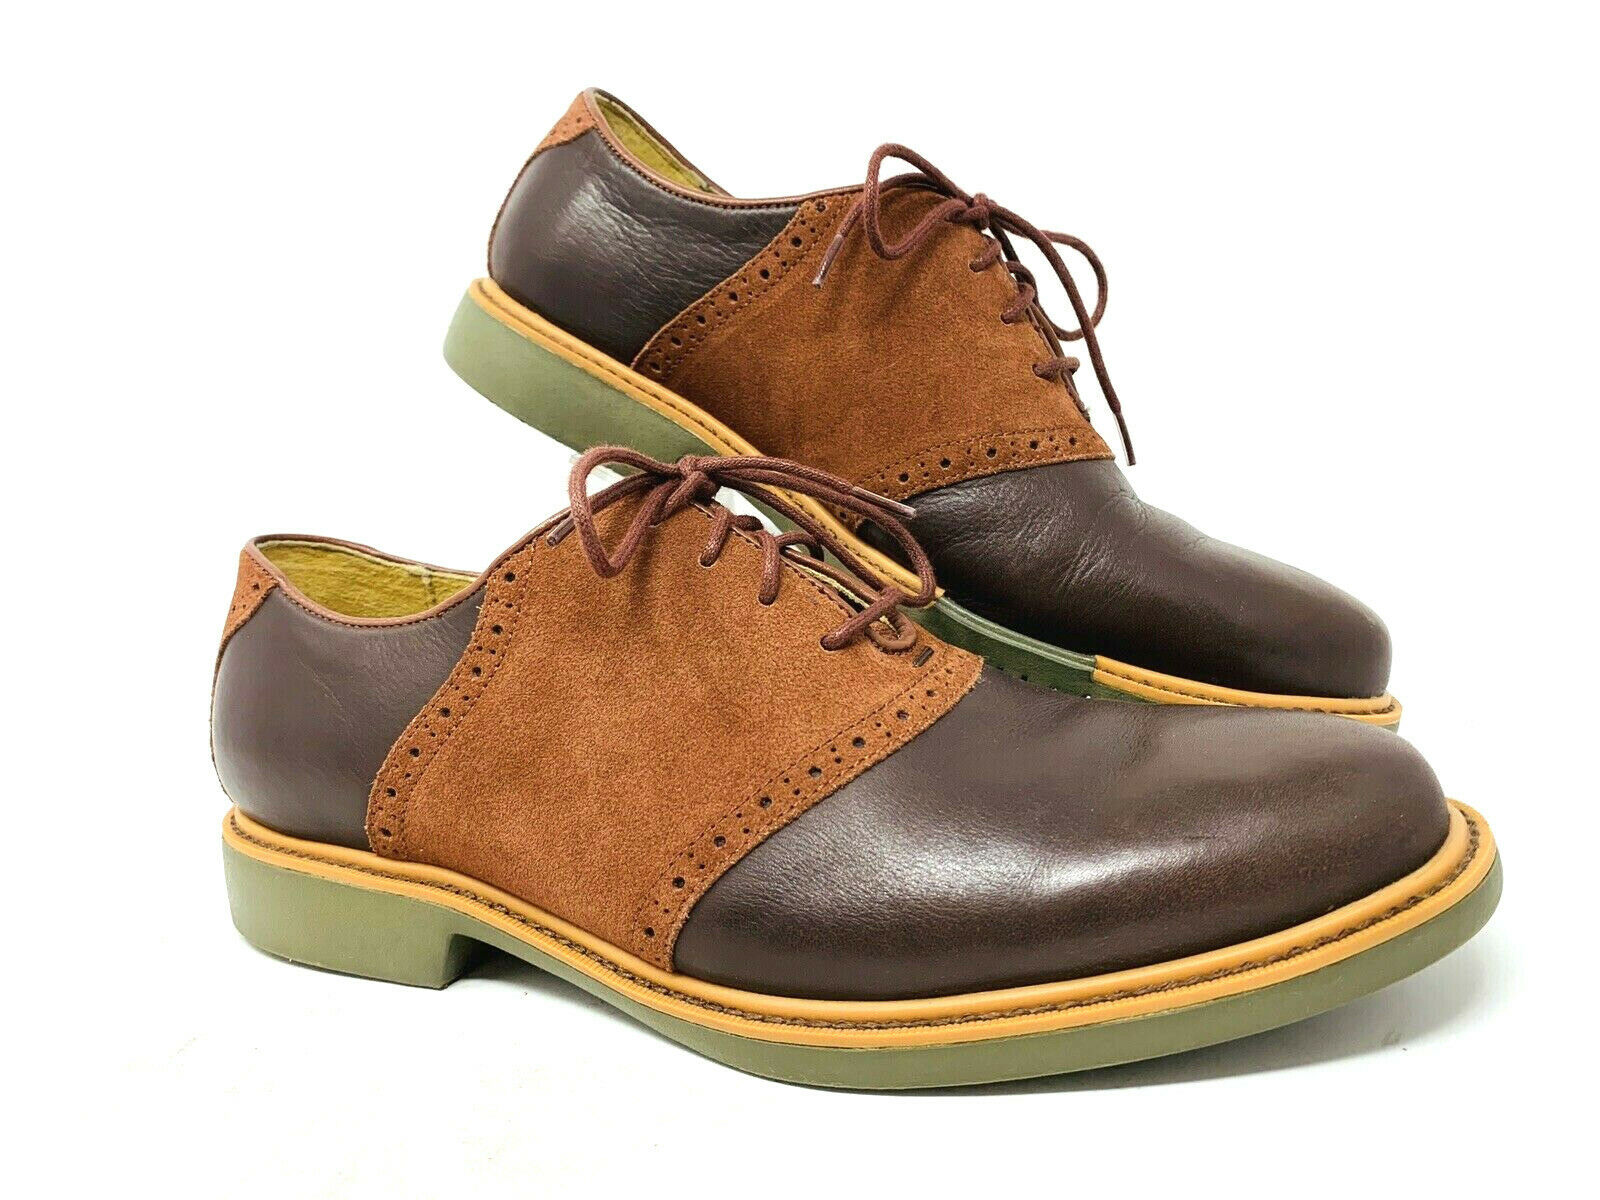 Cole Haan Grand.OS 9M  Mens Marronee Nubuck Suede Leather Wing Tip Career Work scarpe  fabbrica diretta